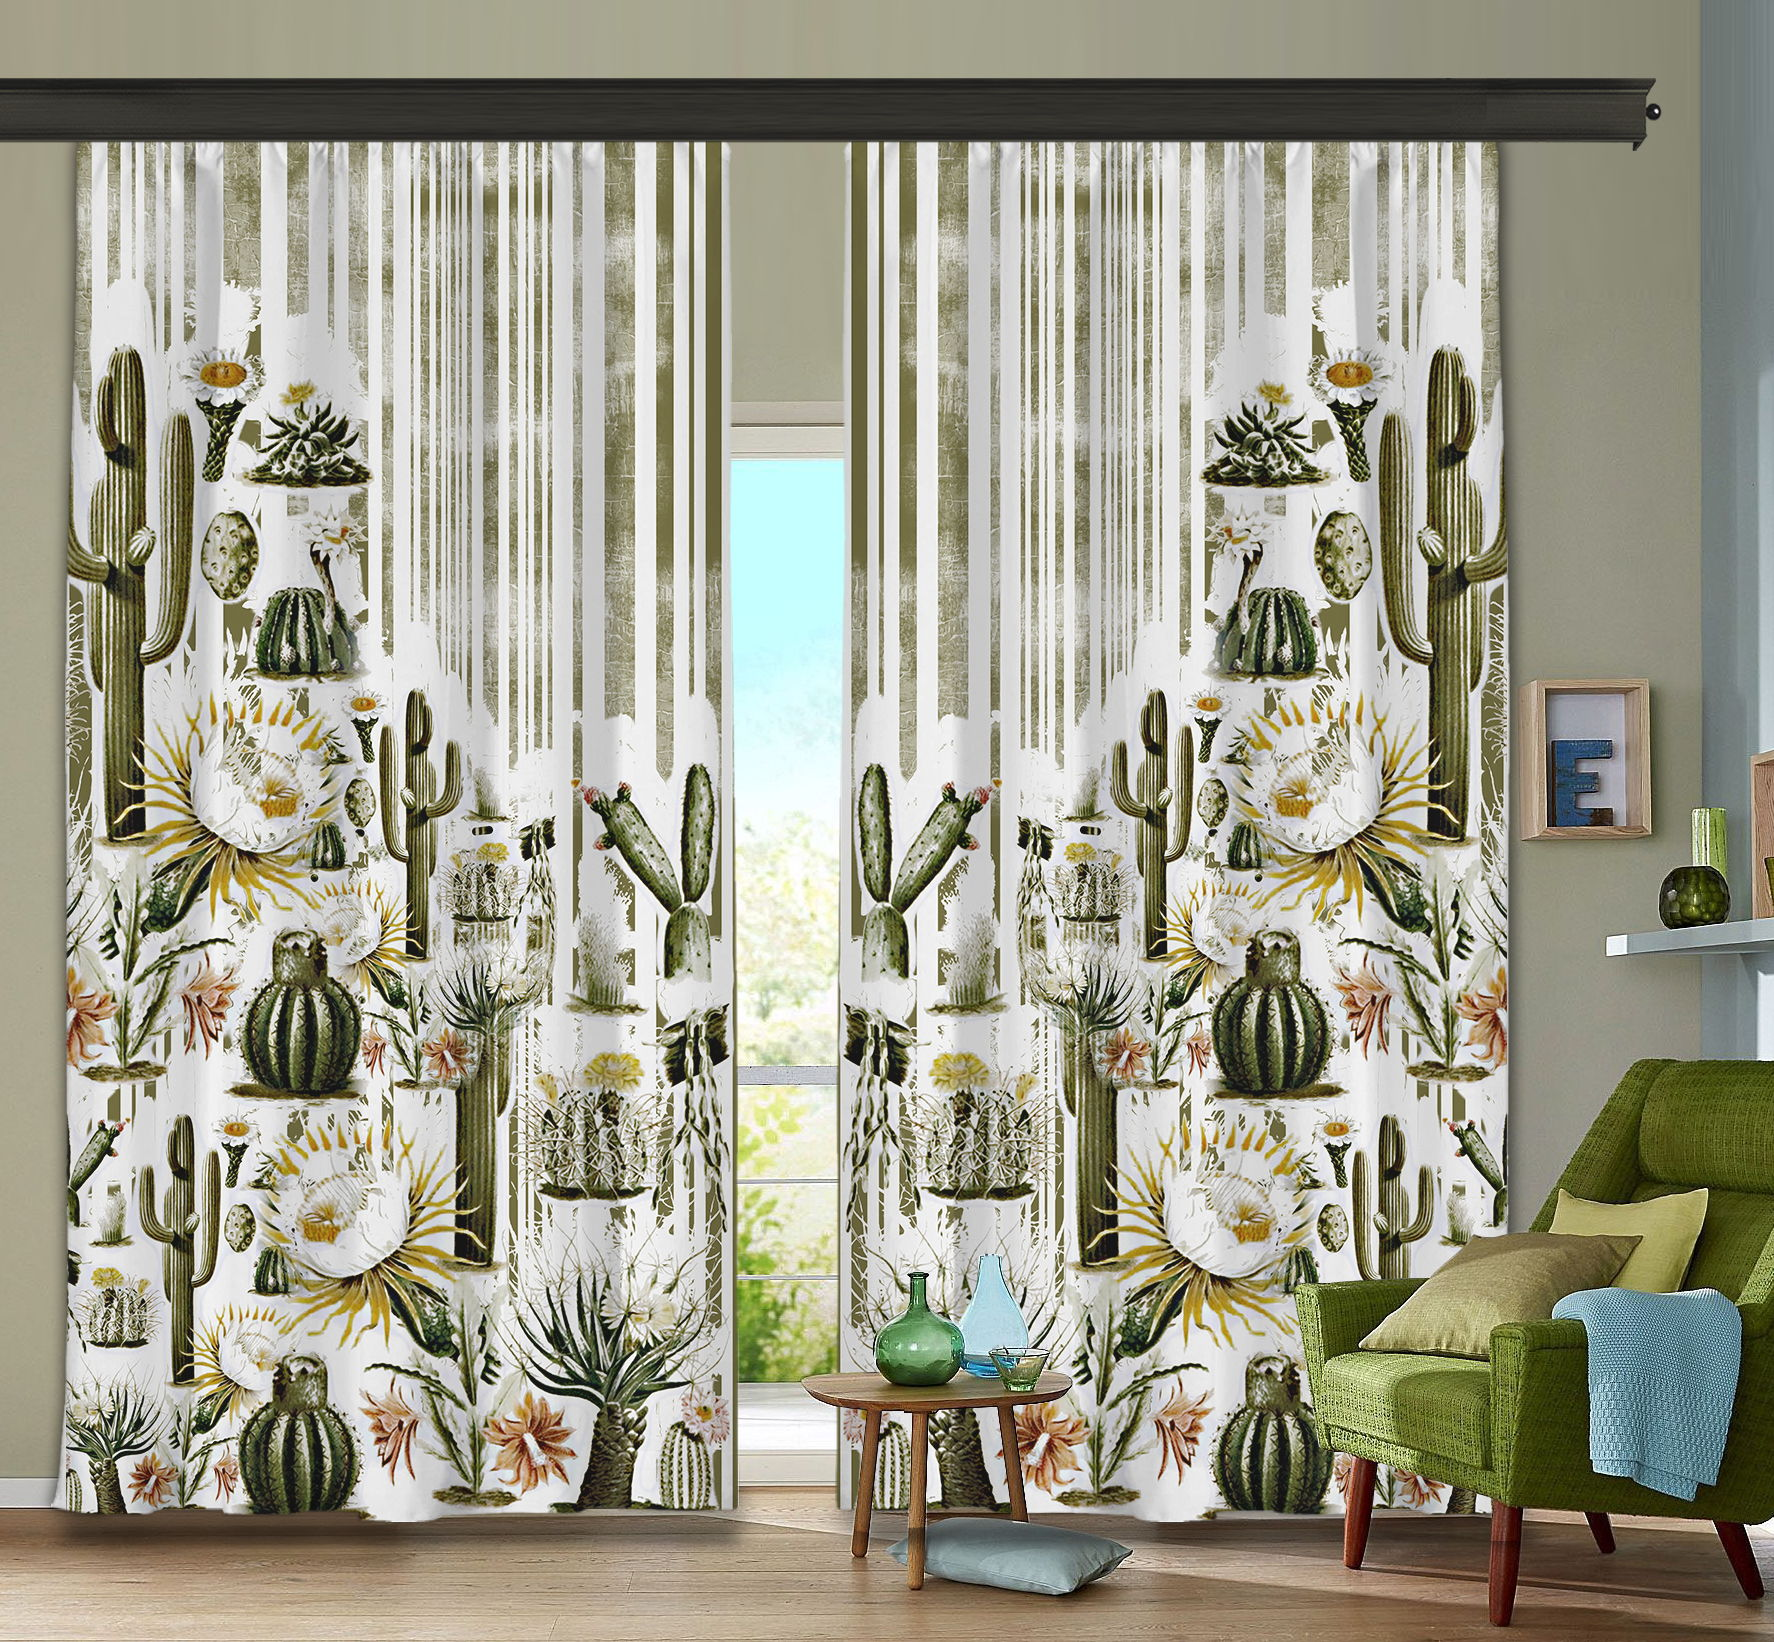 Curtain Usage 1